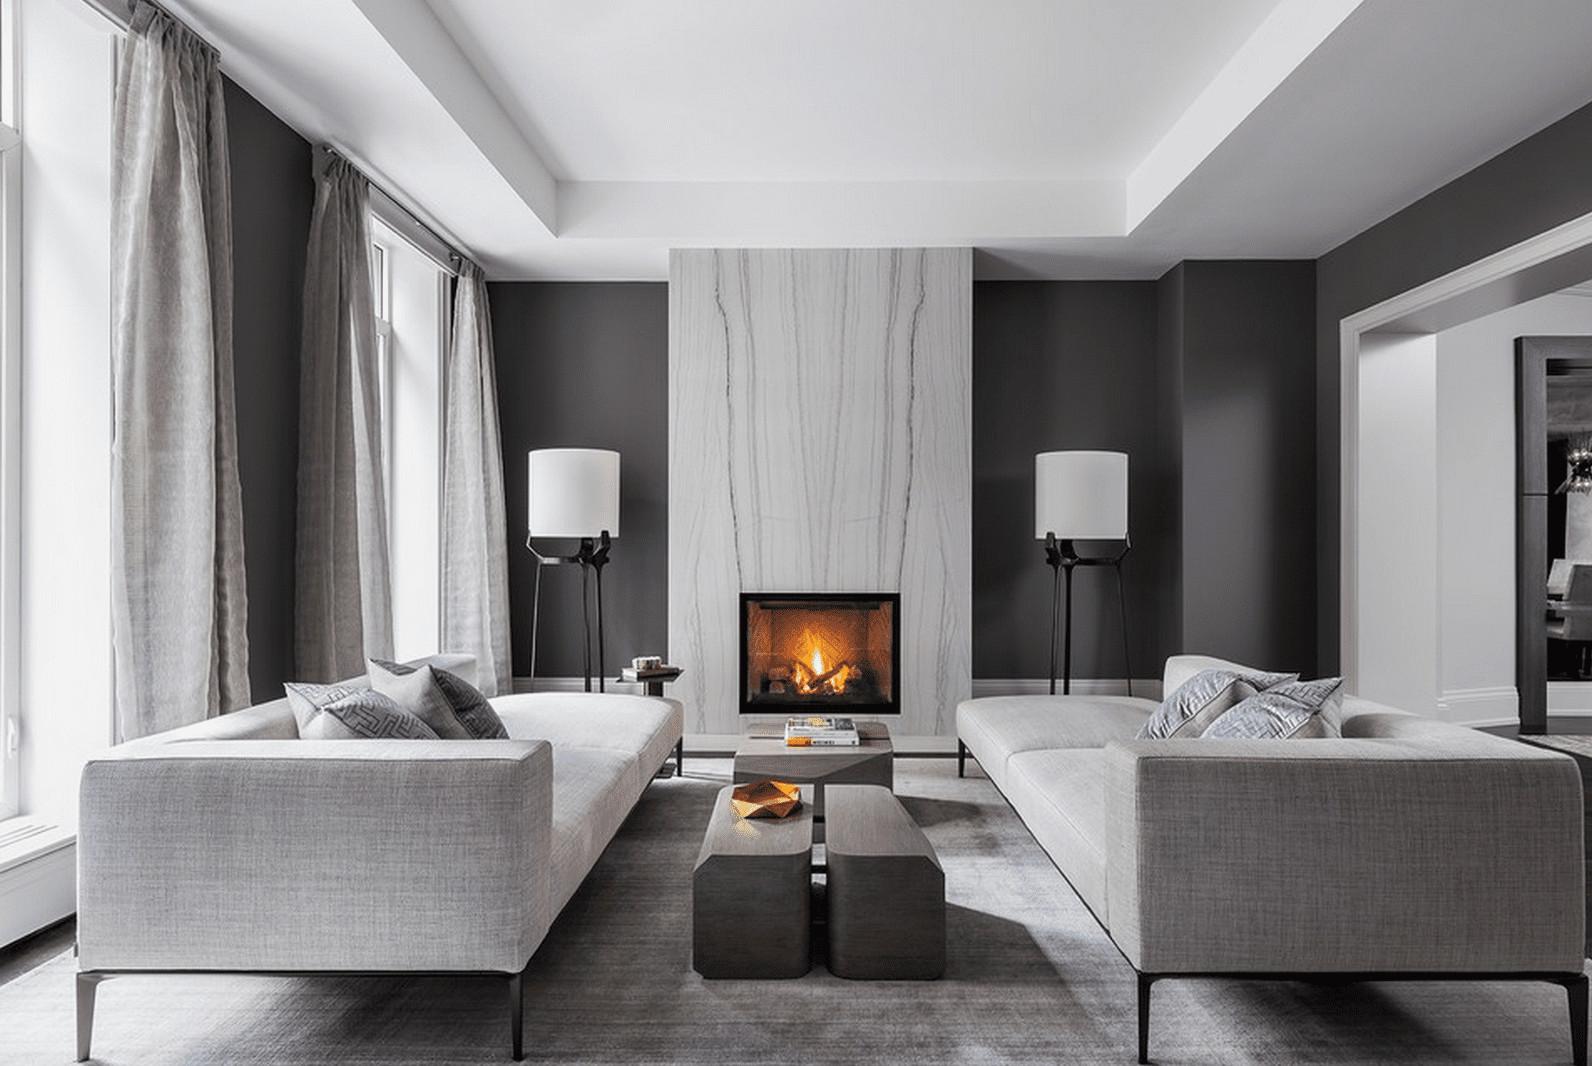 Extra Modern Living Room Decorating Ideas 21 Modern Living Room Design Ideas